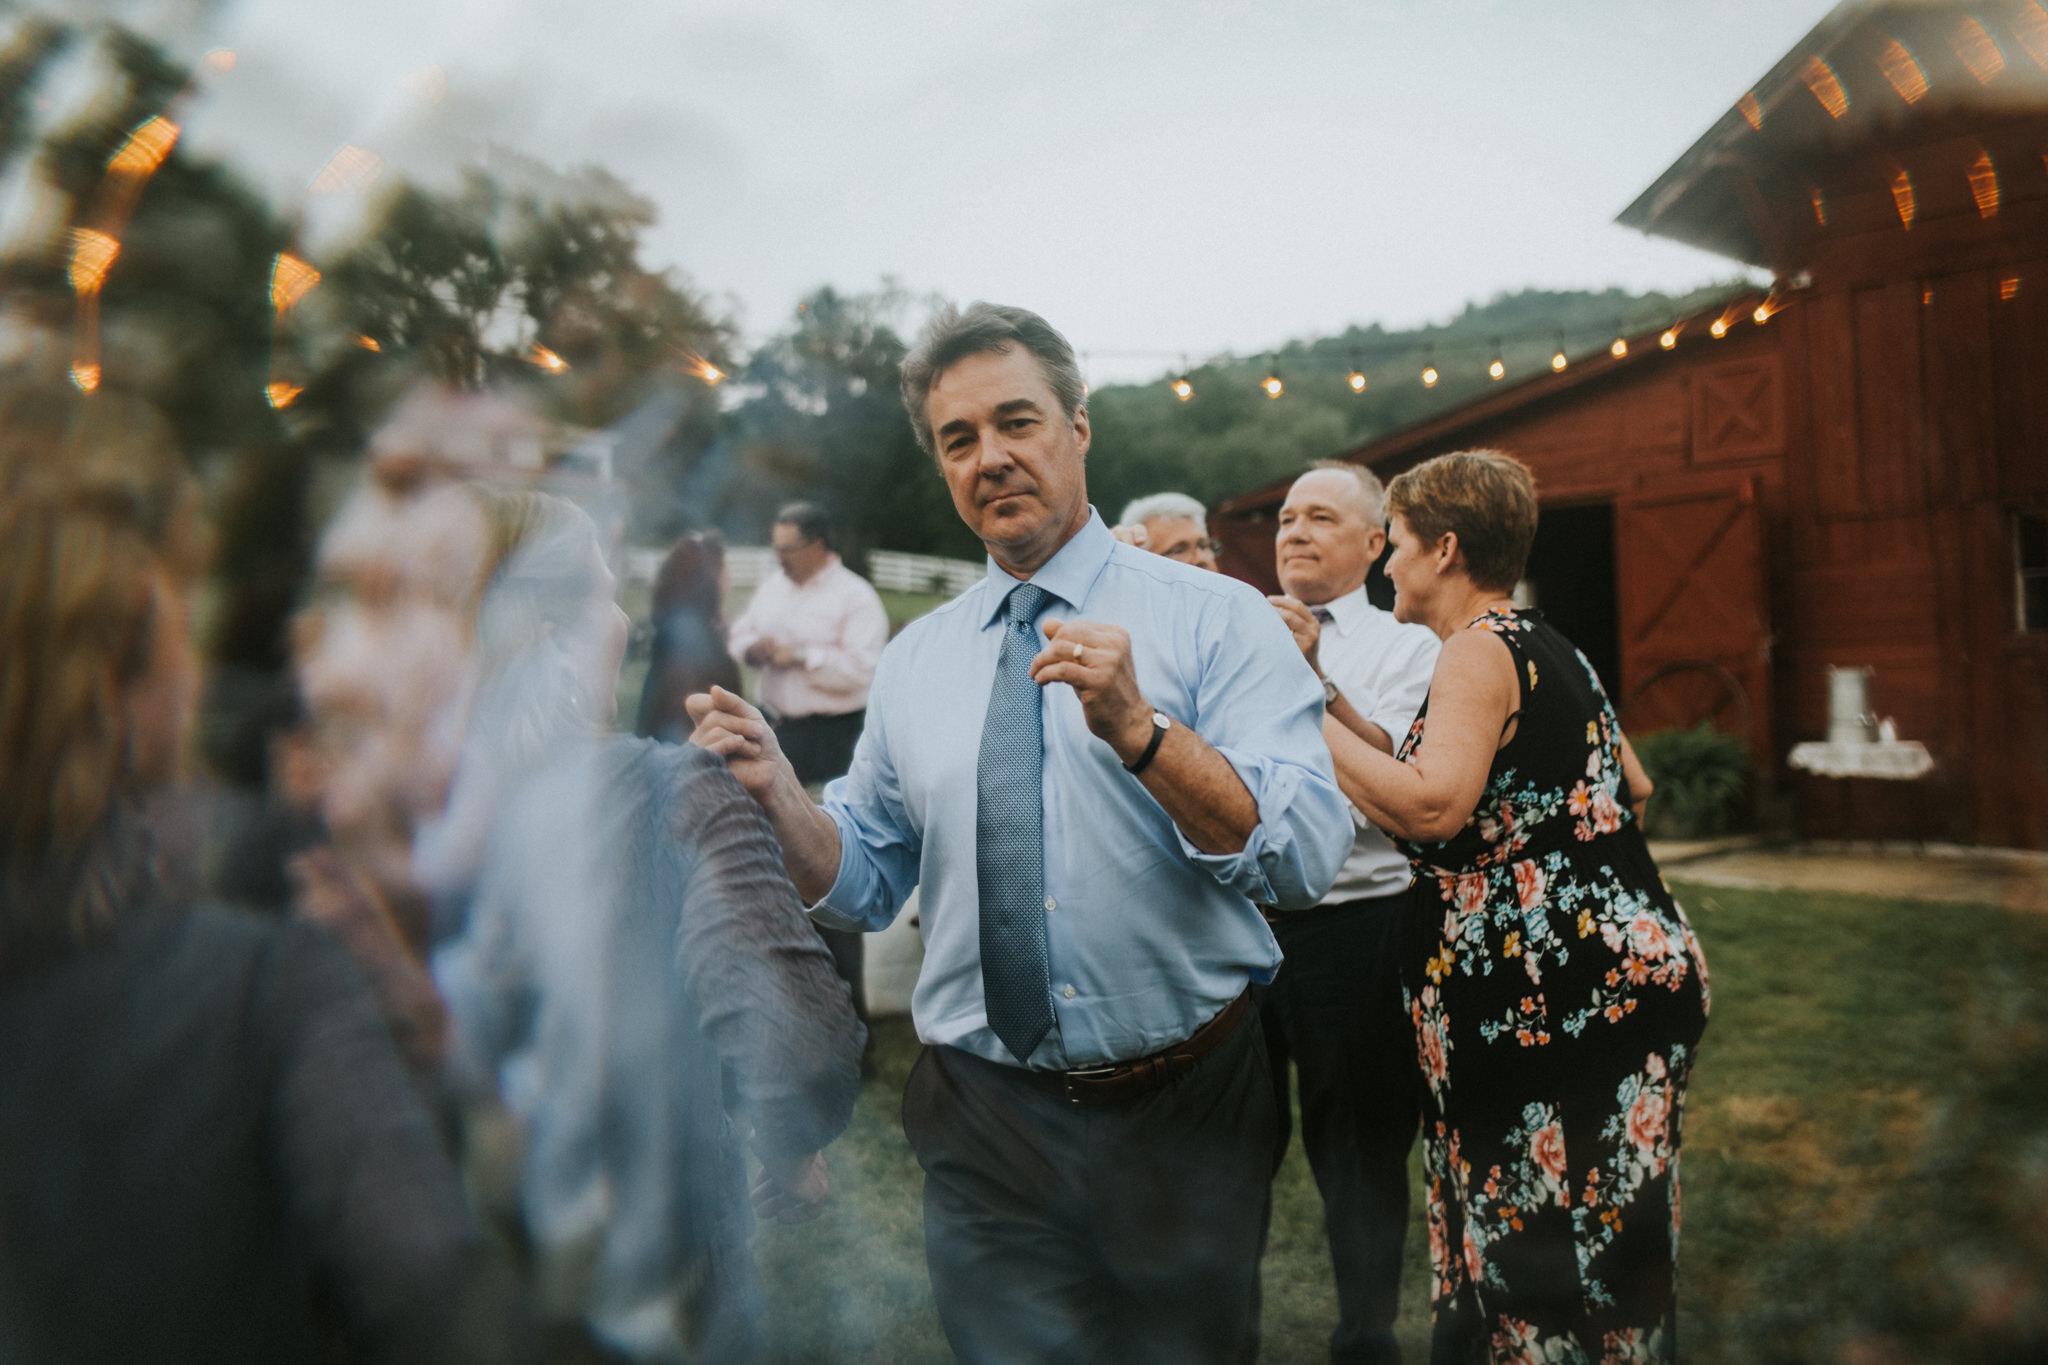 KateMatt-North-Georgia-Wedding-Photographer-Mountain-Laurel-Farm-156.jpg